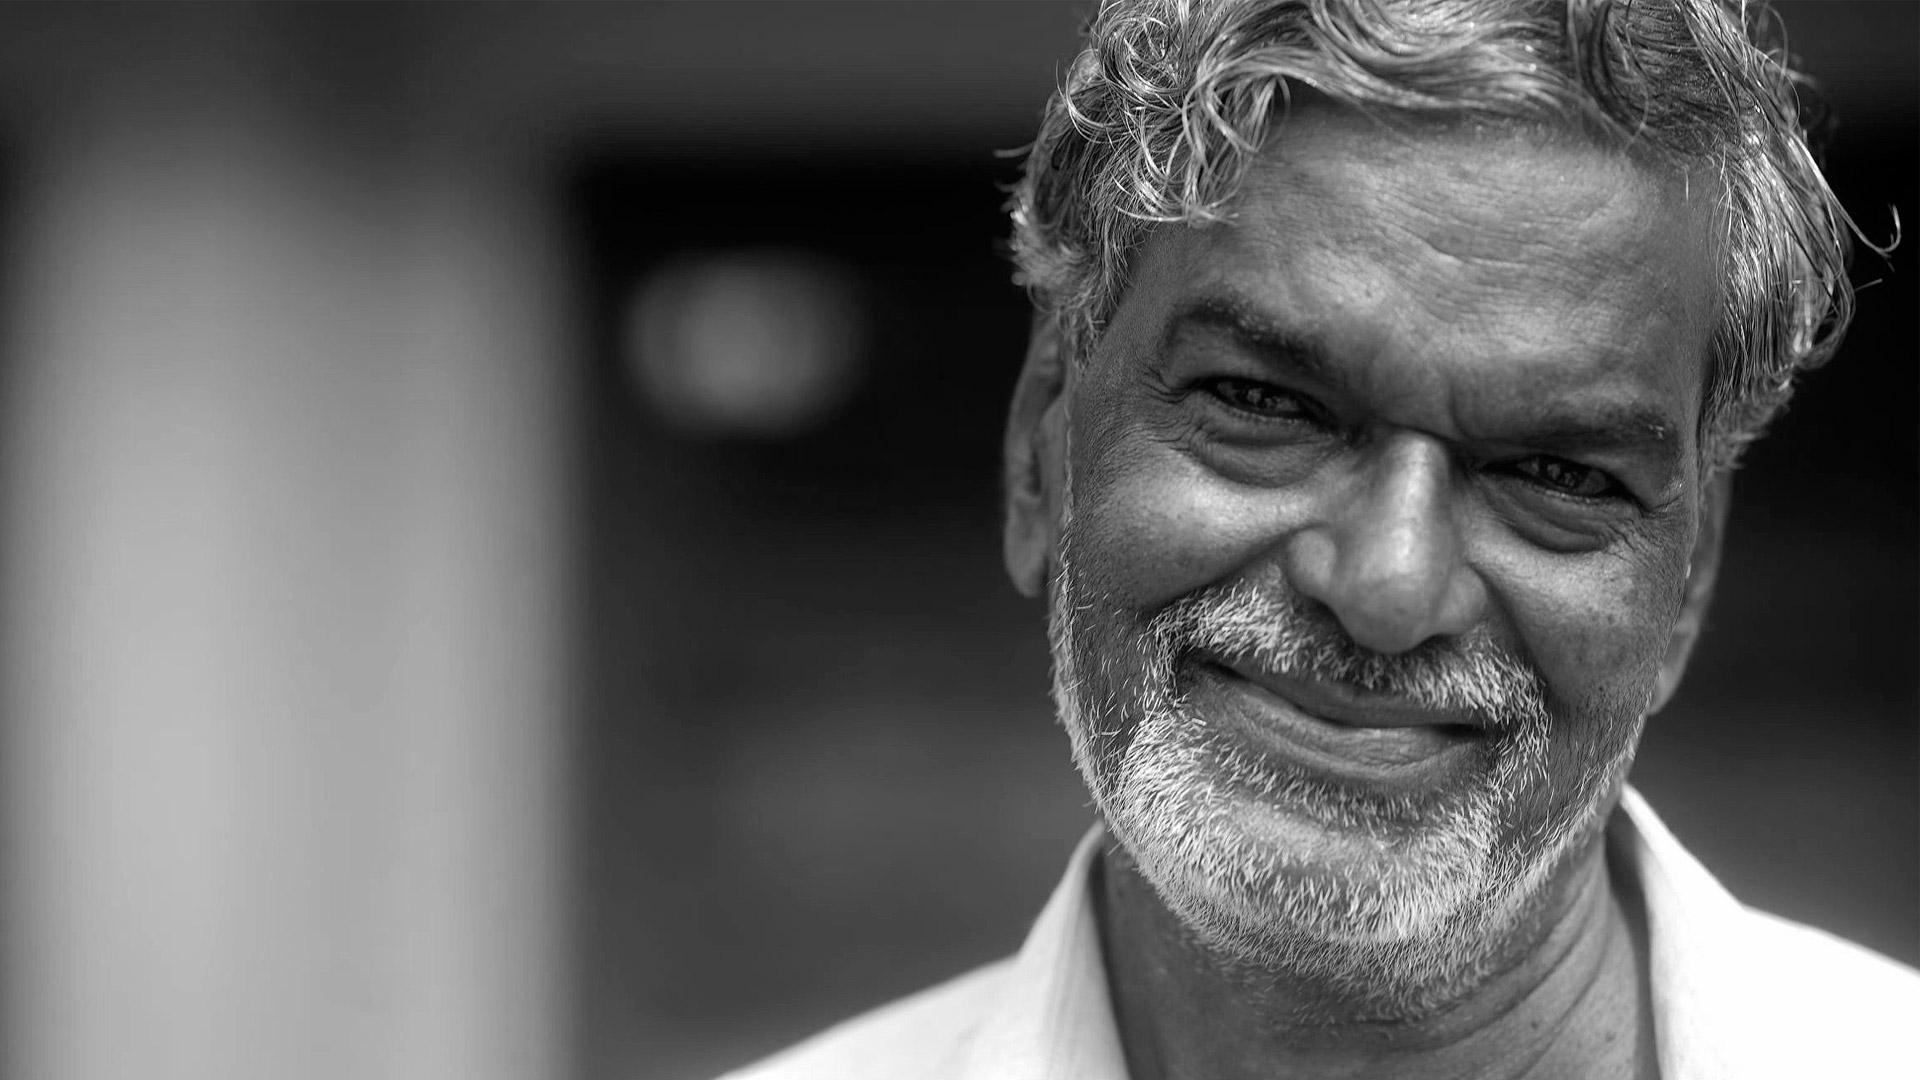 An Open Letter to Anant Kumar Hegde Sahib by Devanoora Mahadeva